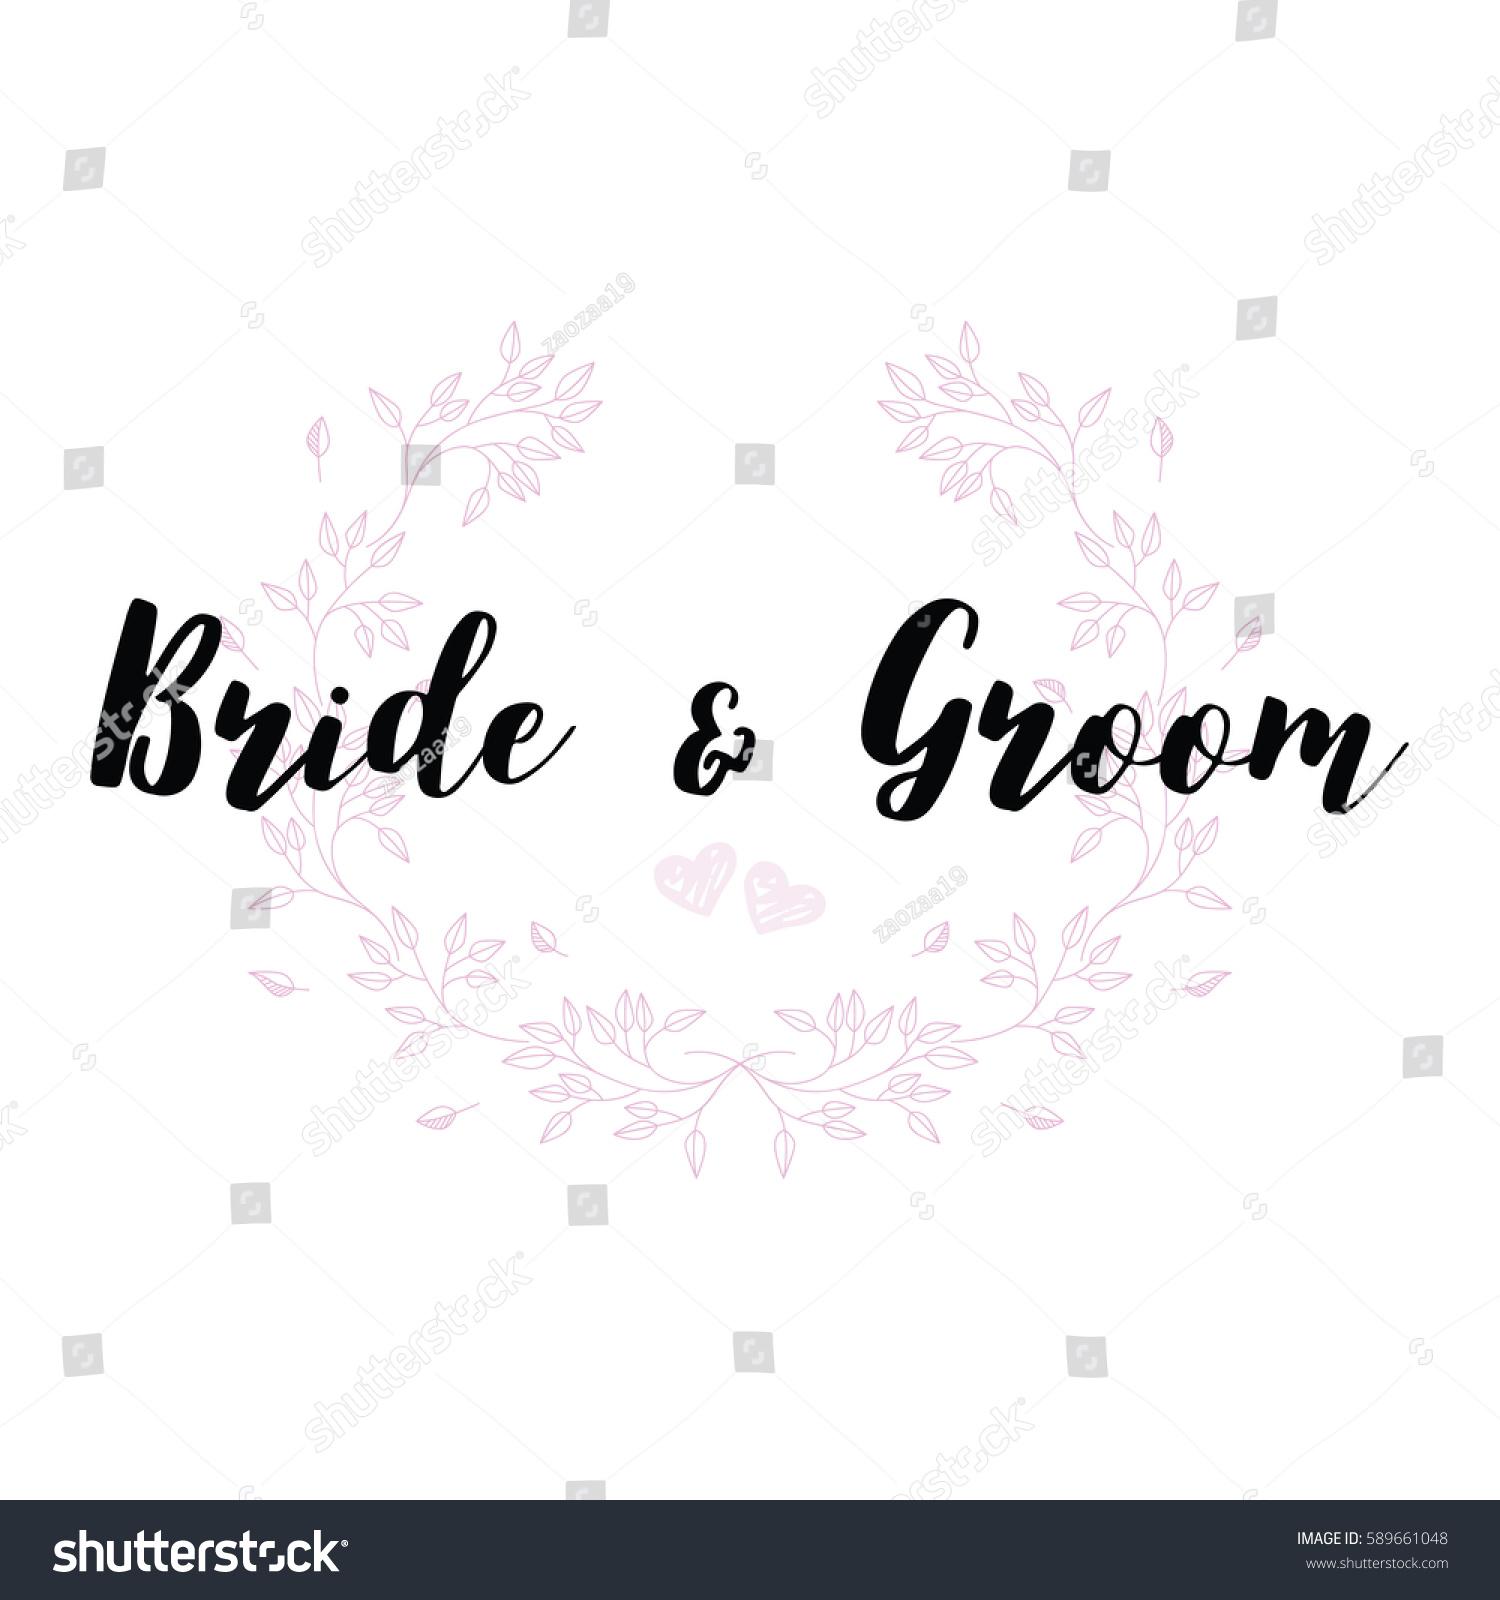 Wedding Quotes Set Design Wedding Invitations Stock Vector 589661048 ...